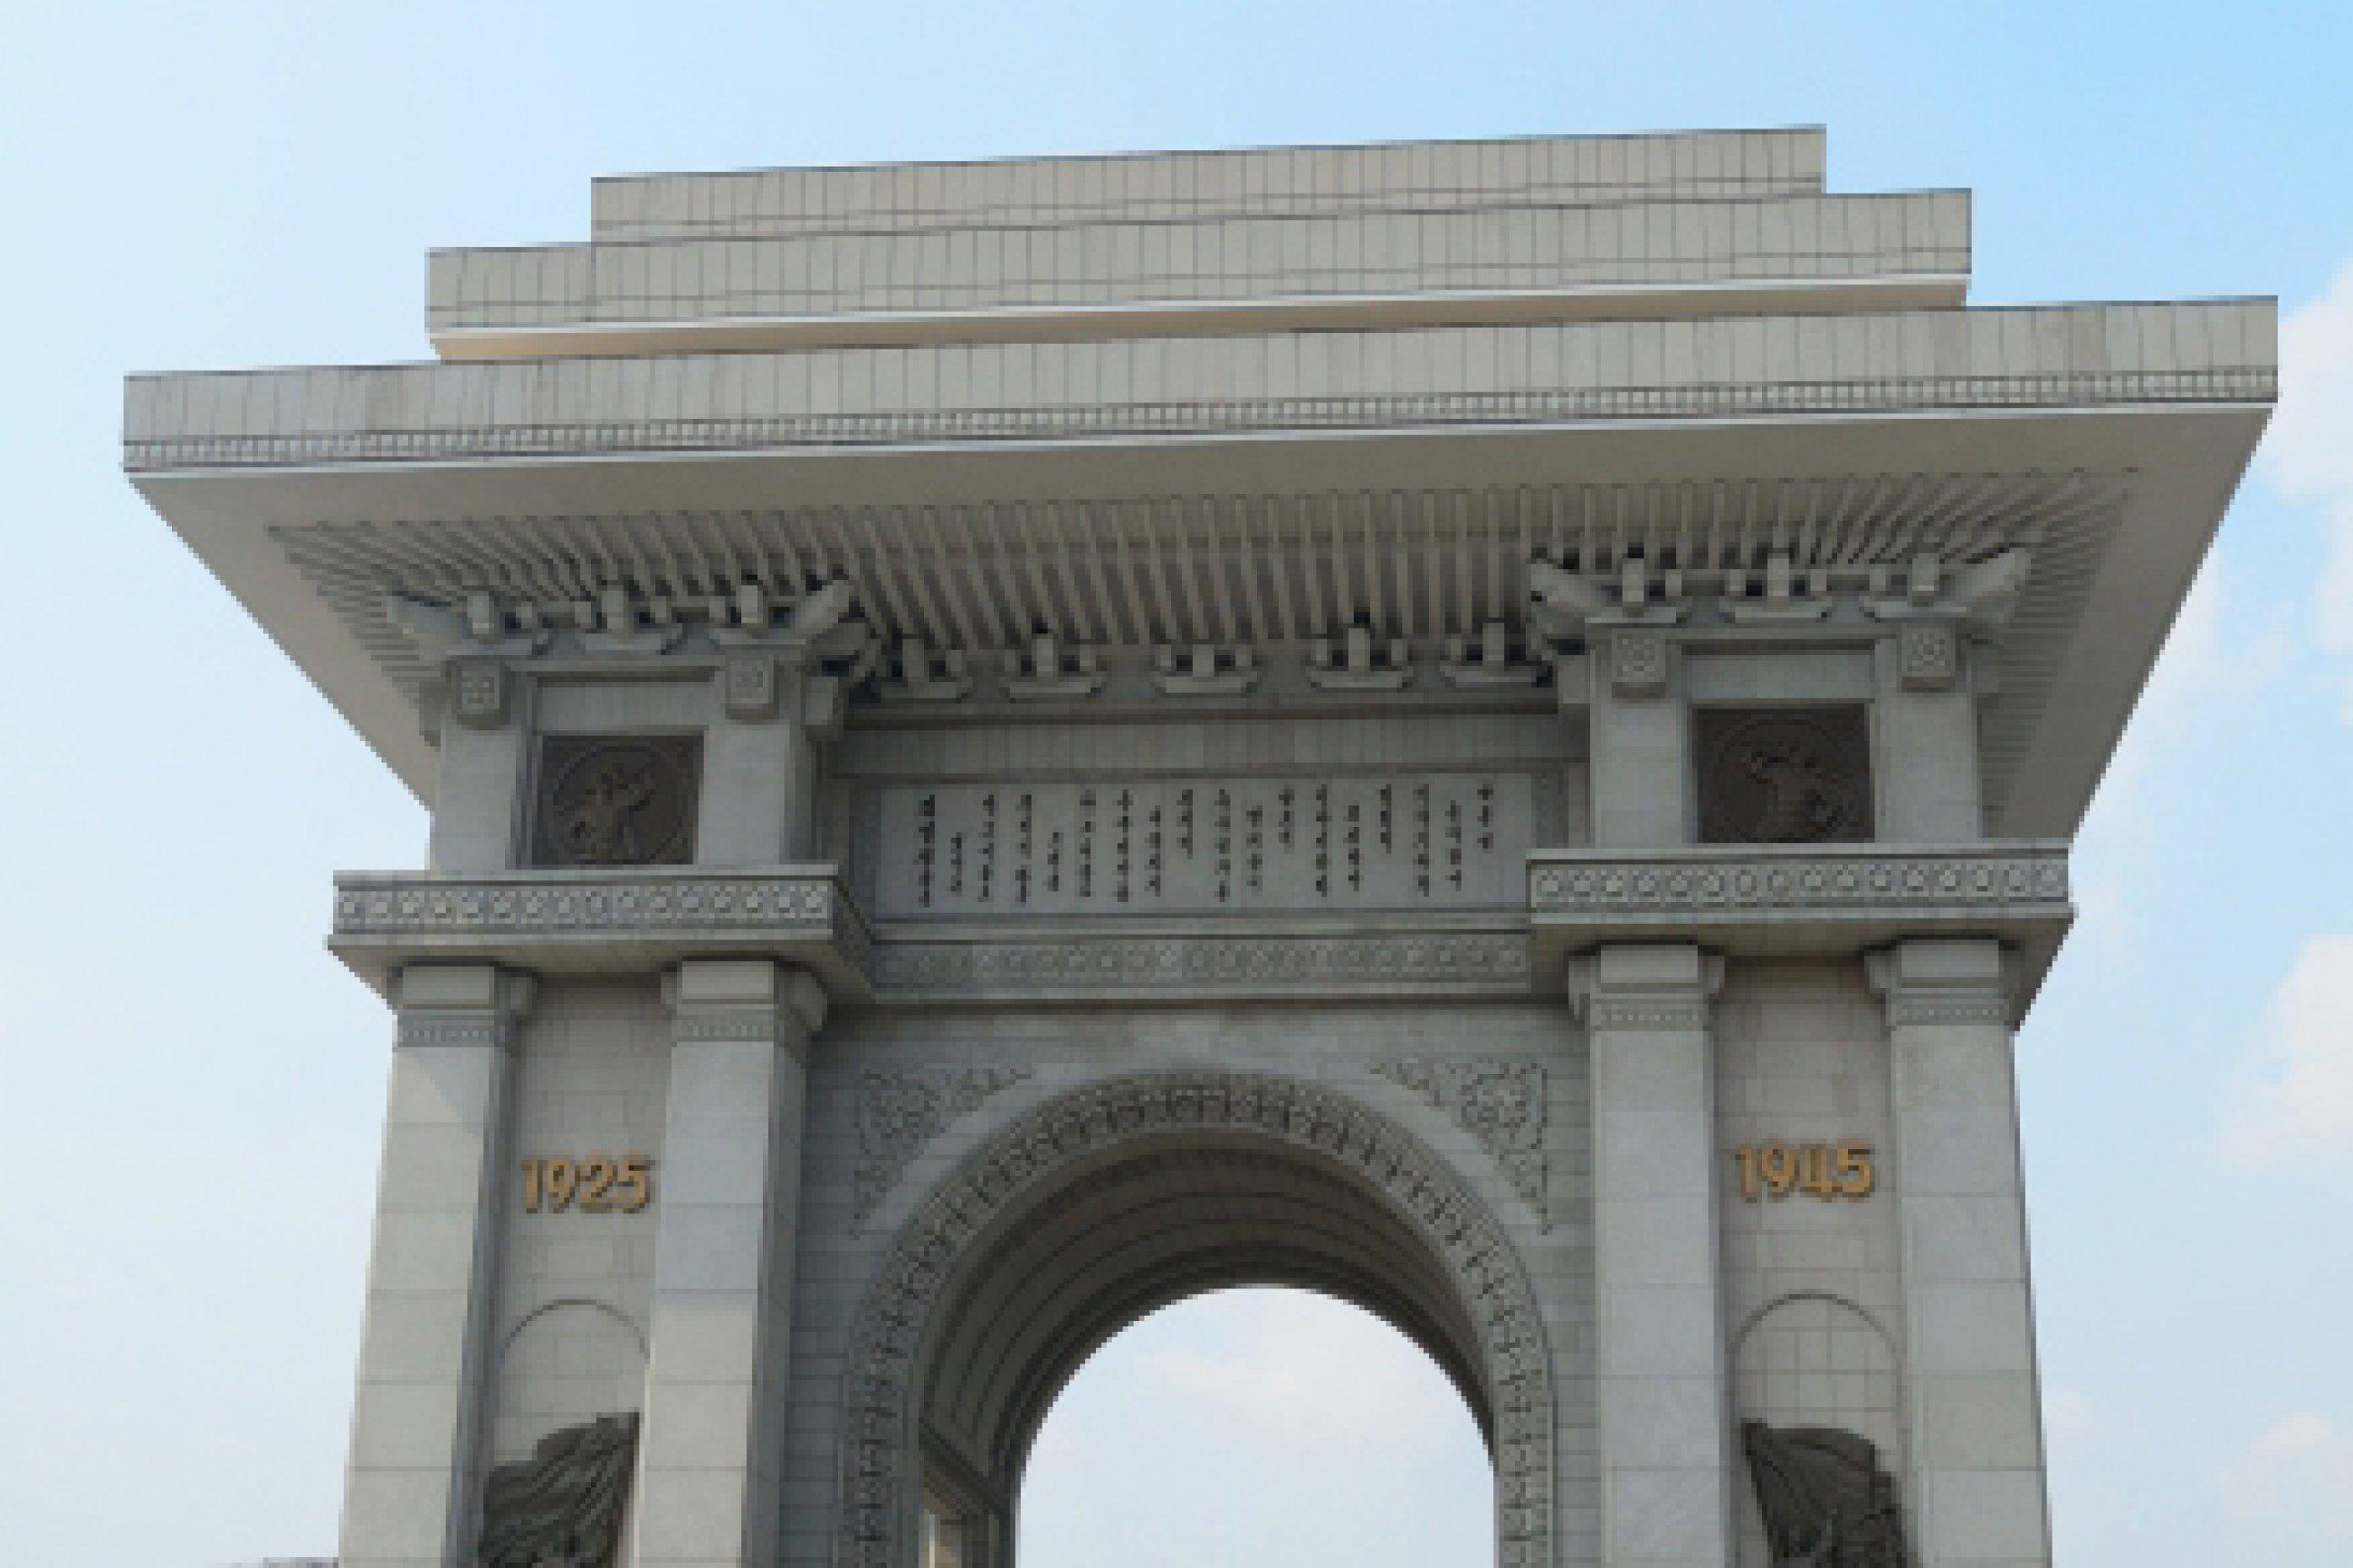 https://bubo.sk/uploads/galleries/7452/arch-of-triumph-pyongyang-north-korea.jpg